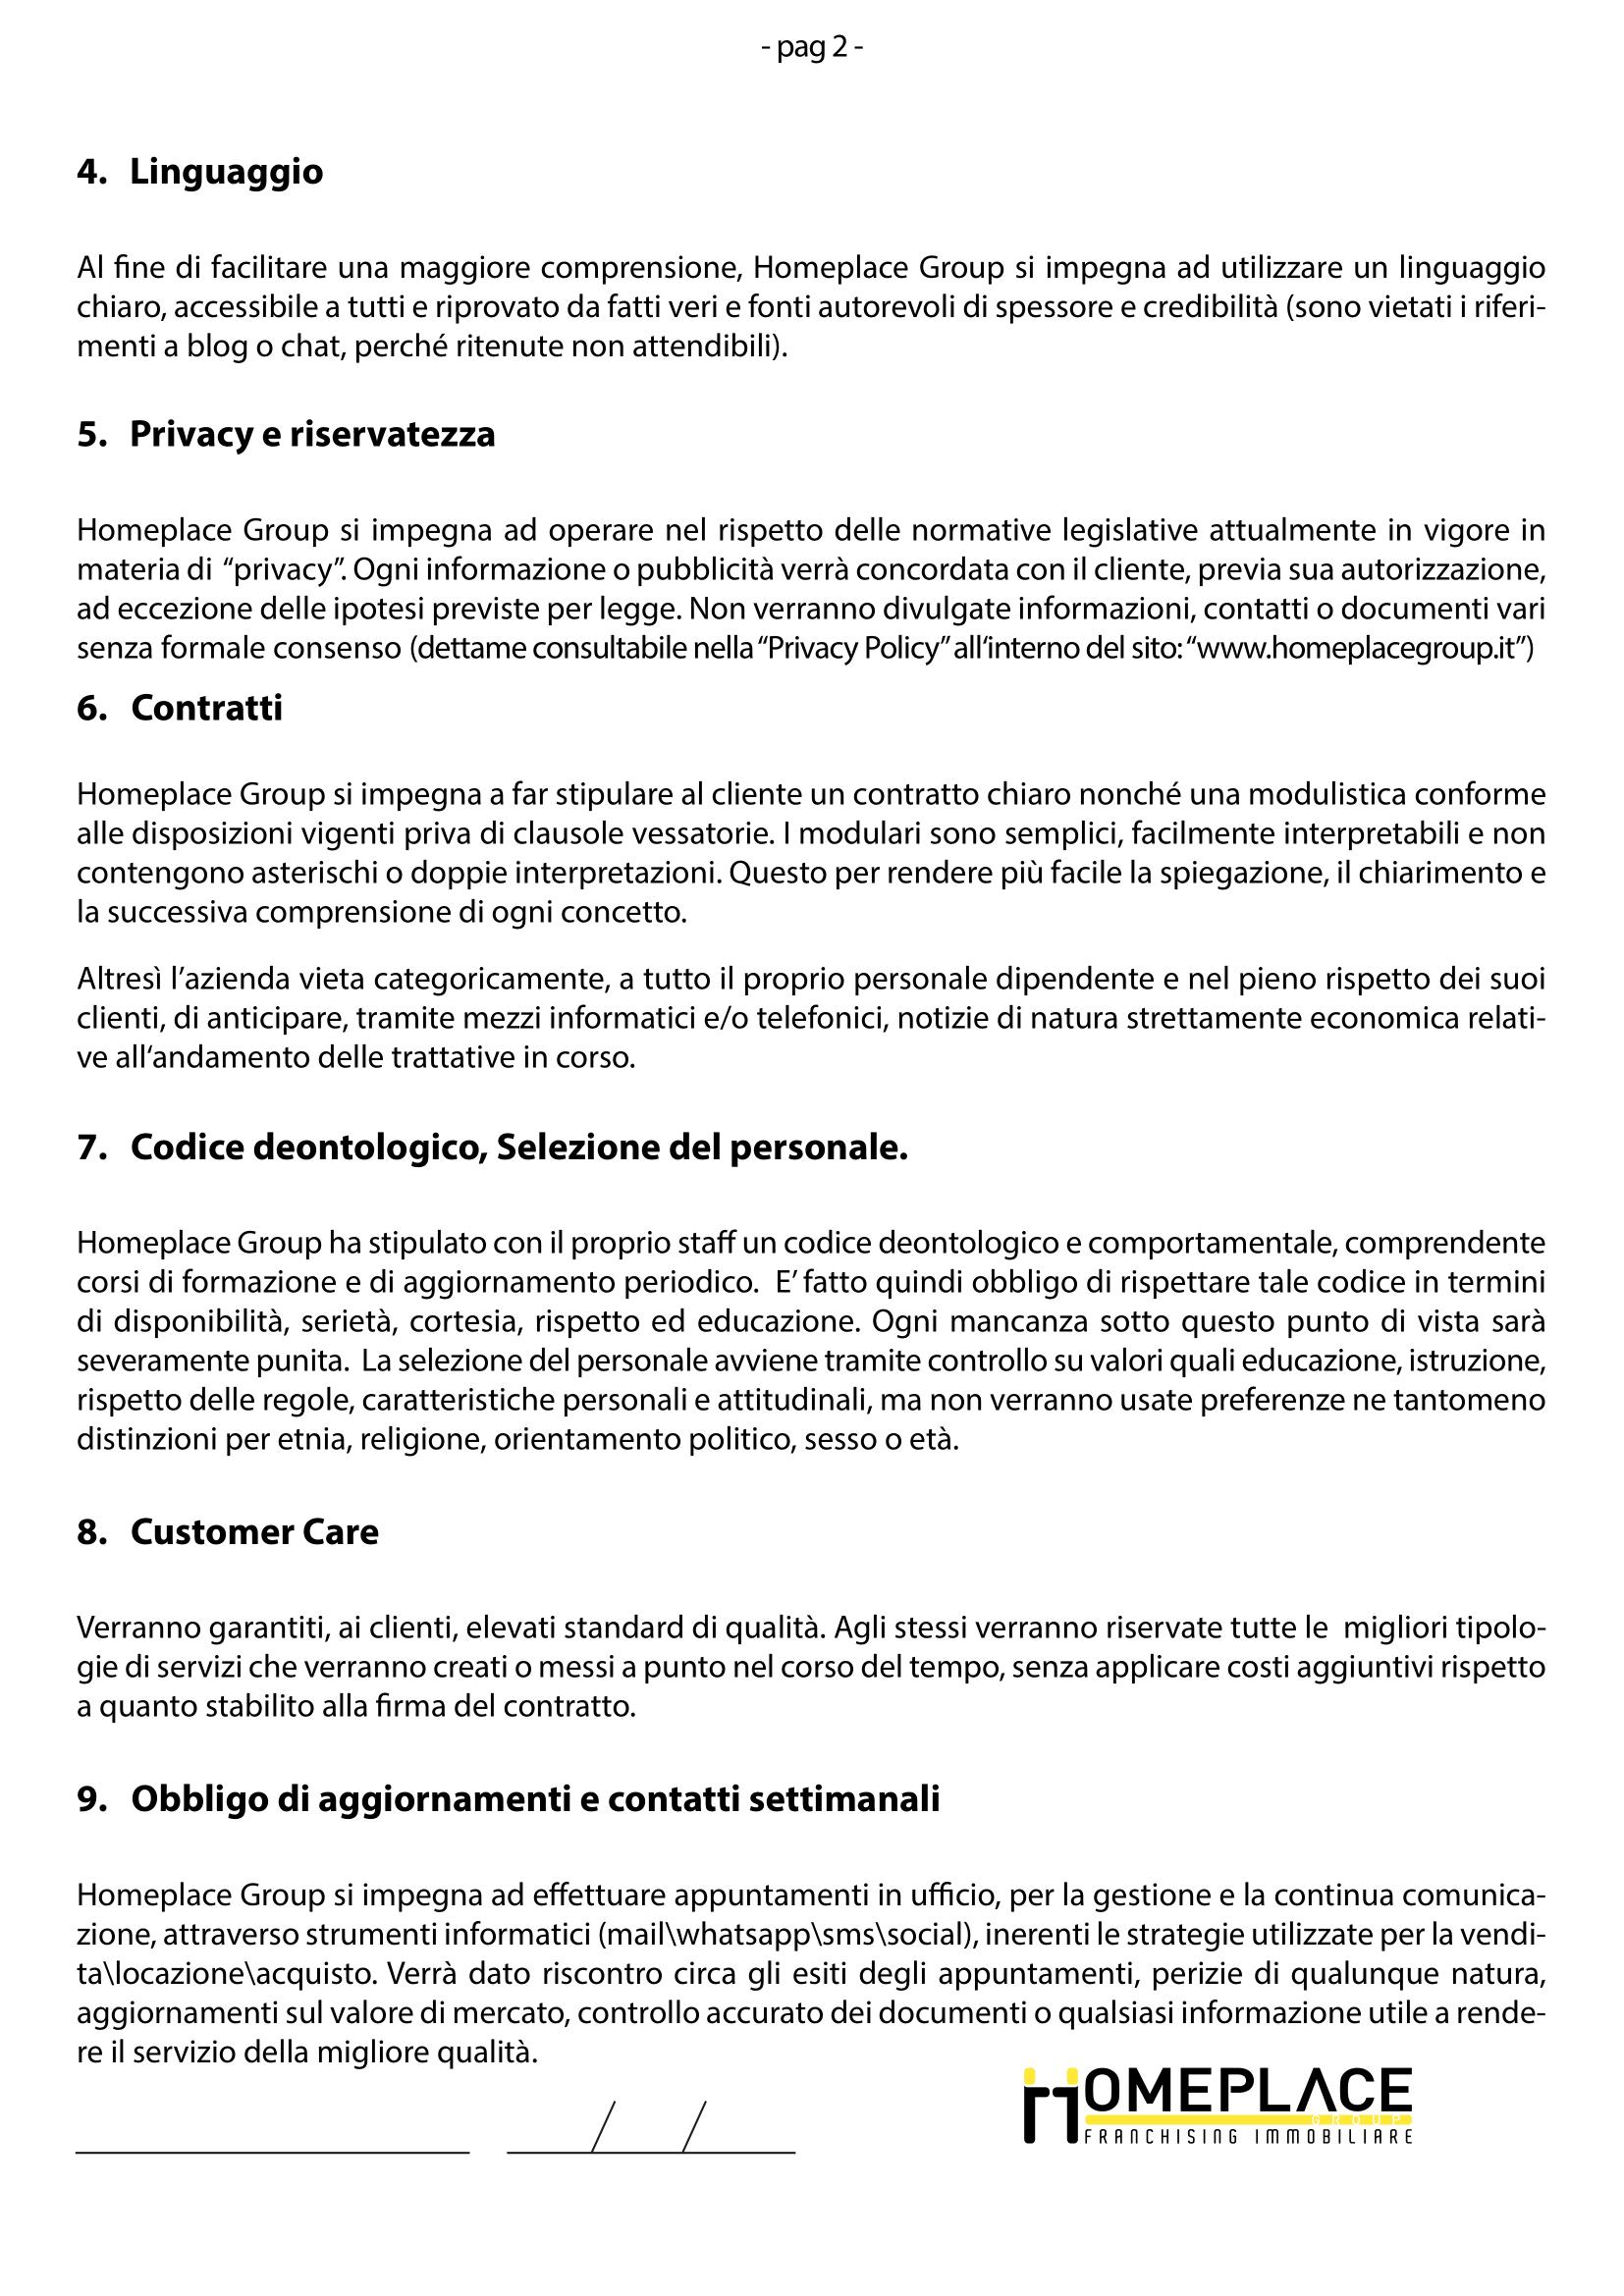 codice etico homeplacegroup circolo chigi